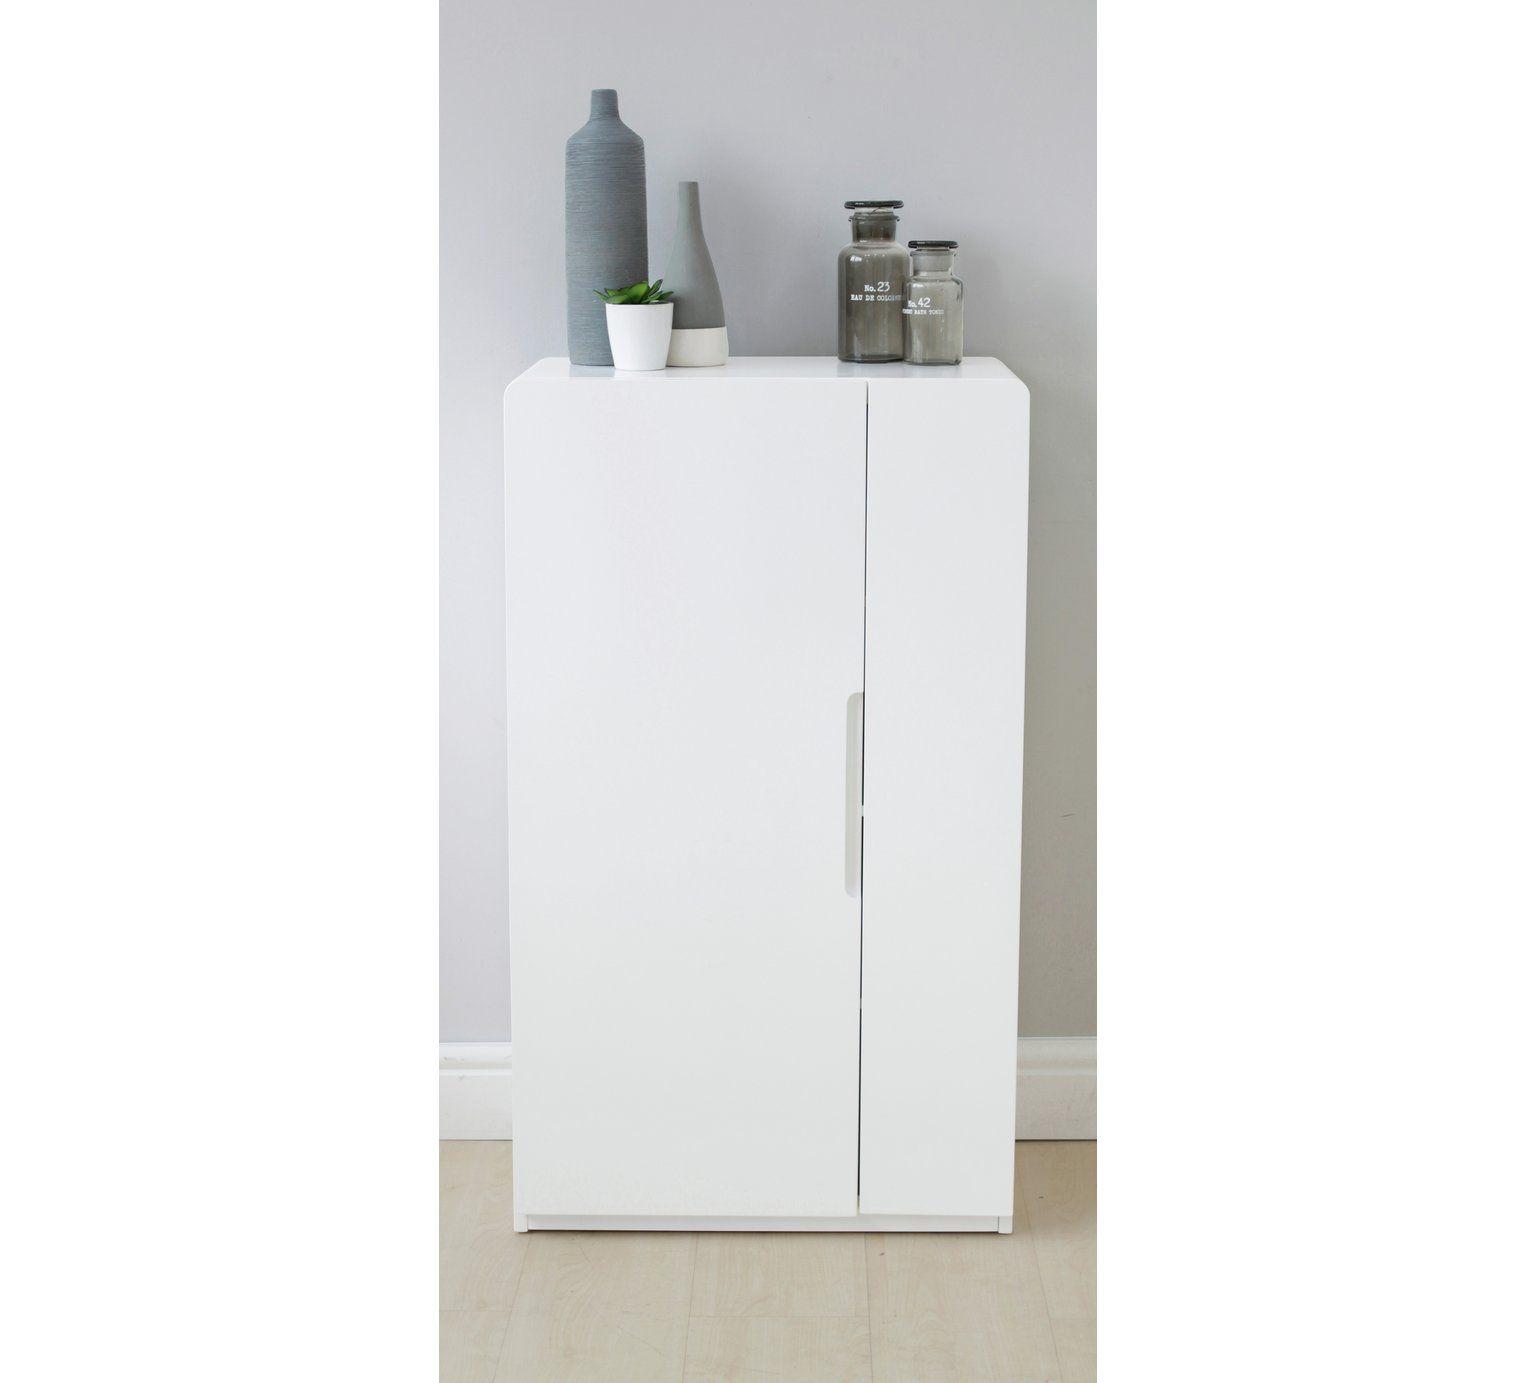 shades bathroom furniture uk%0A Buy Hygena Curve Console Unit  White at Argos co uk  visit Argos